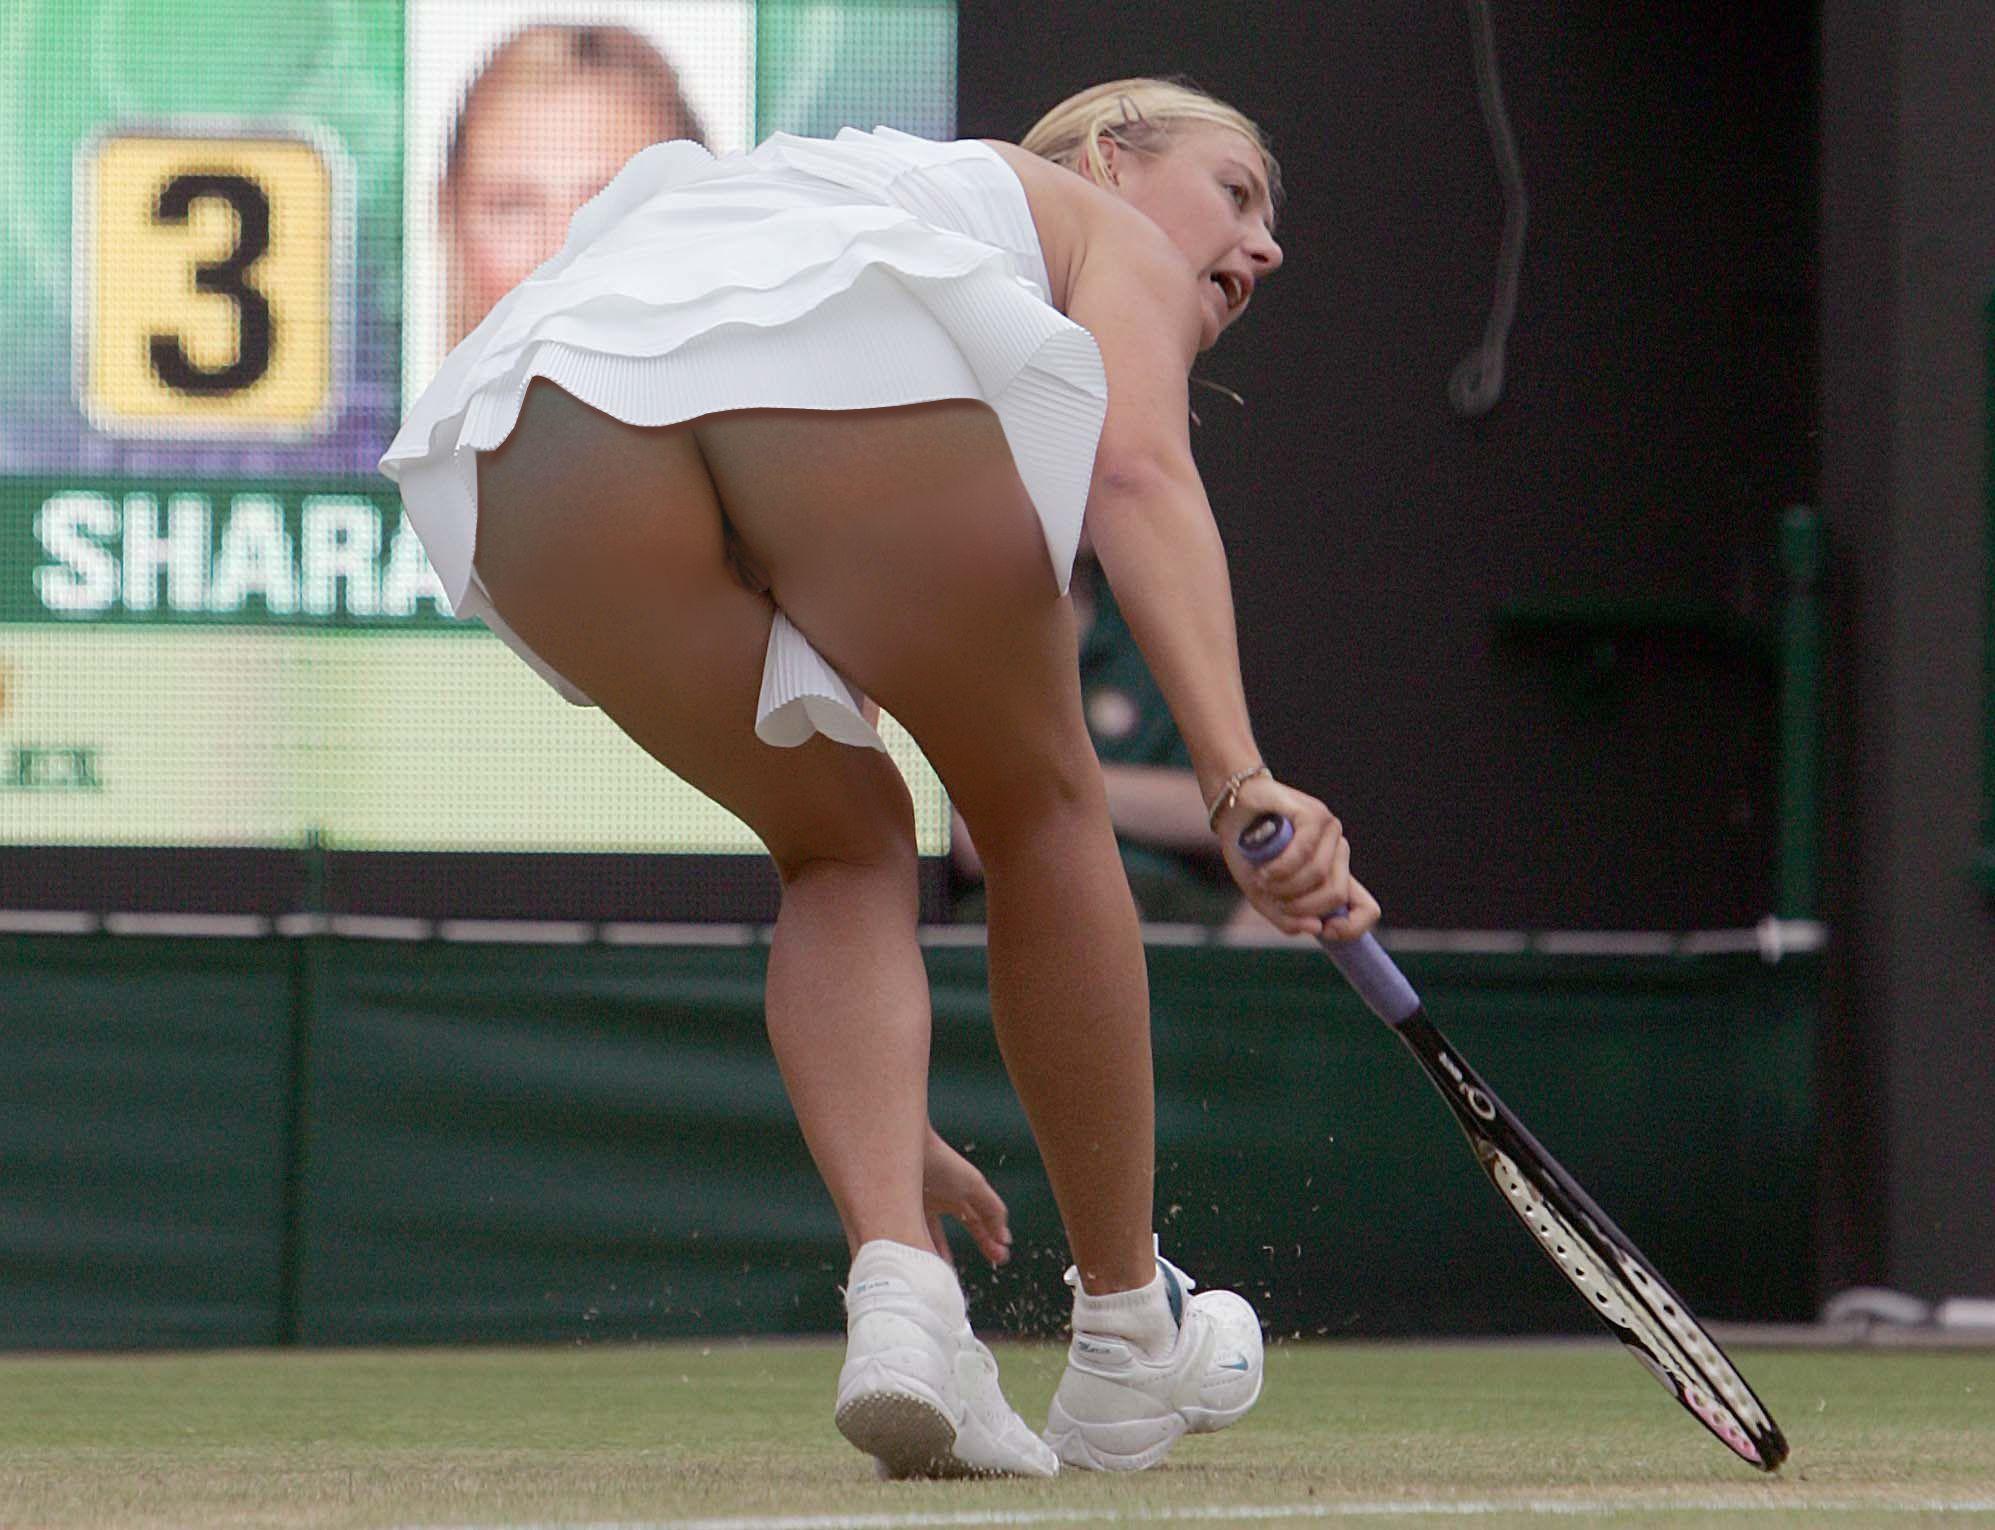 Sharapova Porn Pictures - ImageWeb - Free Porn Pics, Nude